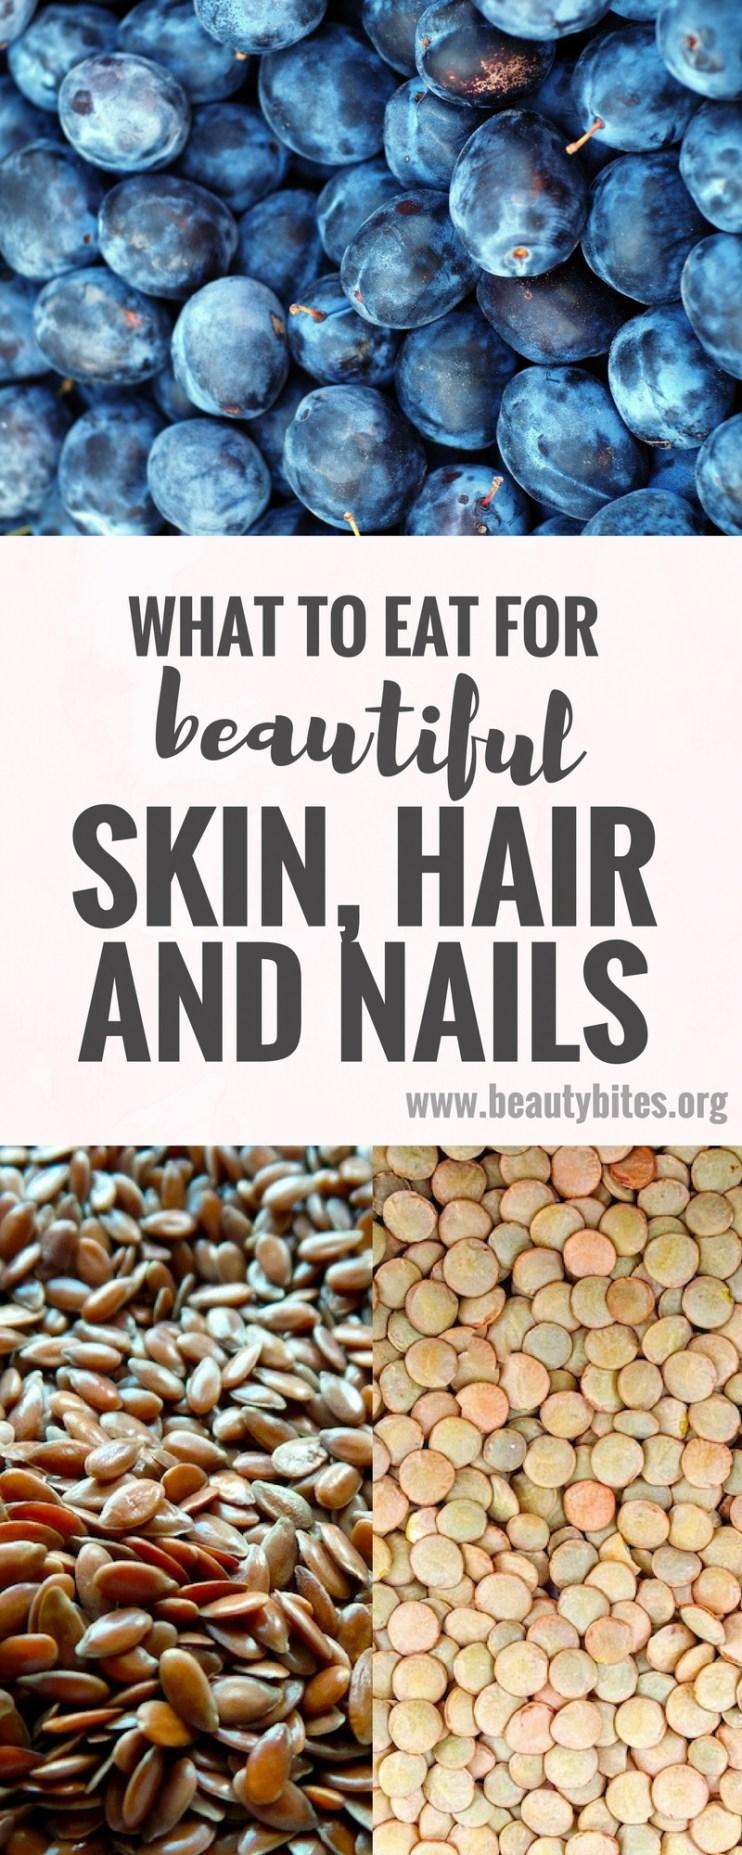 http://www.beautybites.org/vegan-overnight-oats-healthy-heart-skin-brain